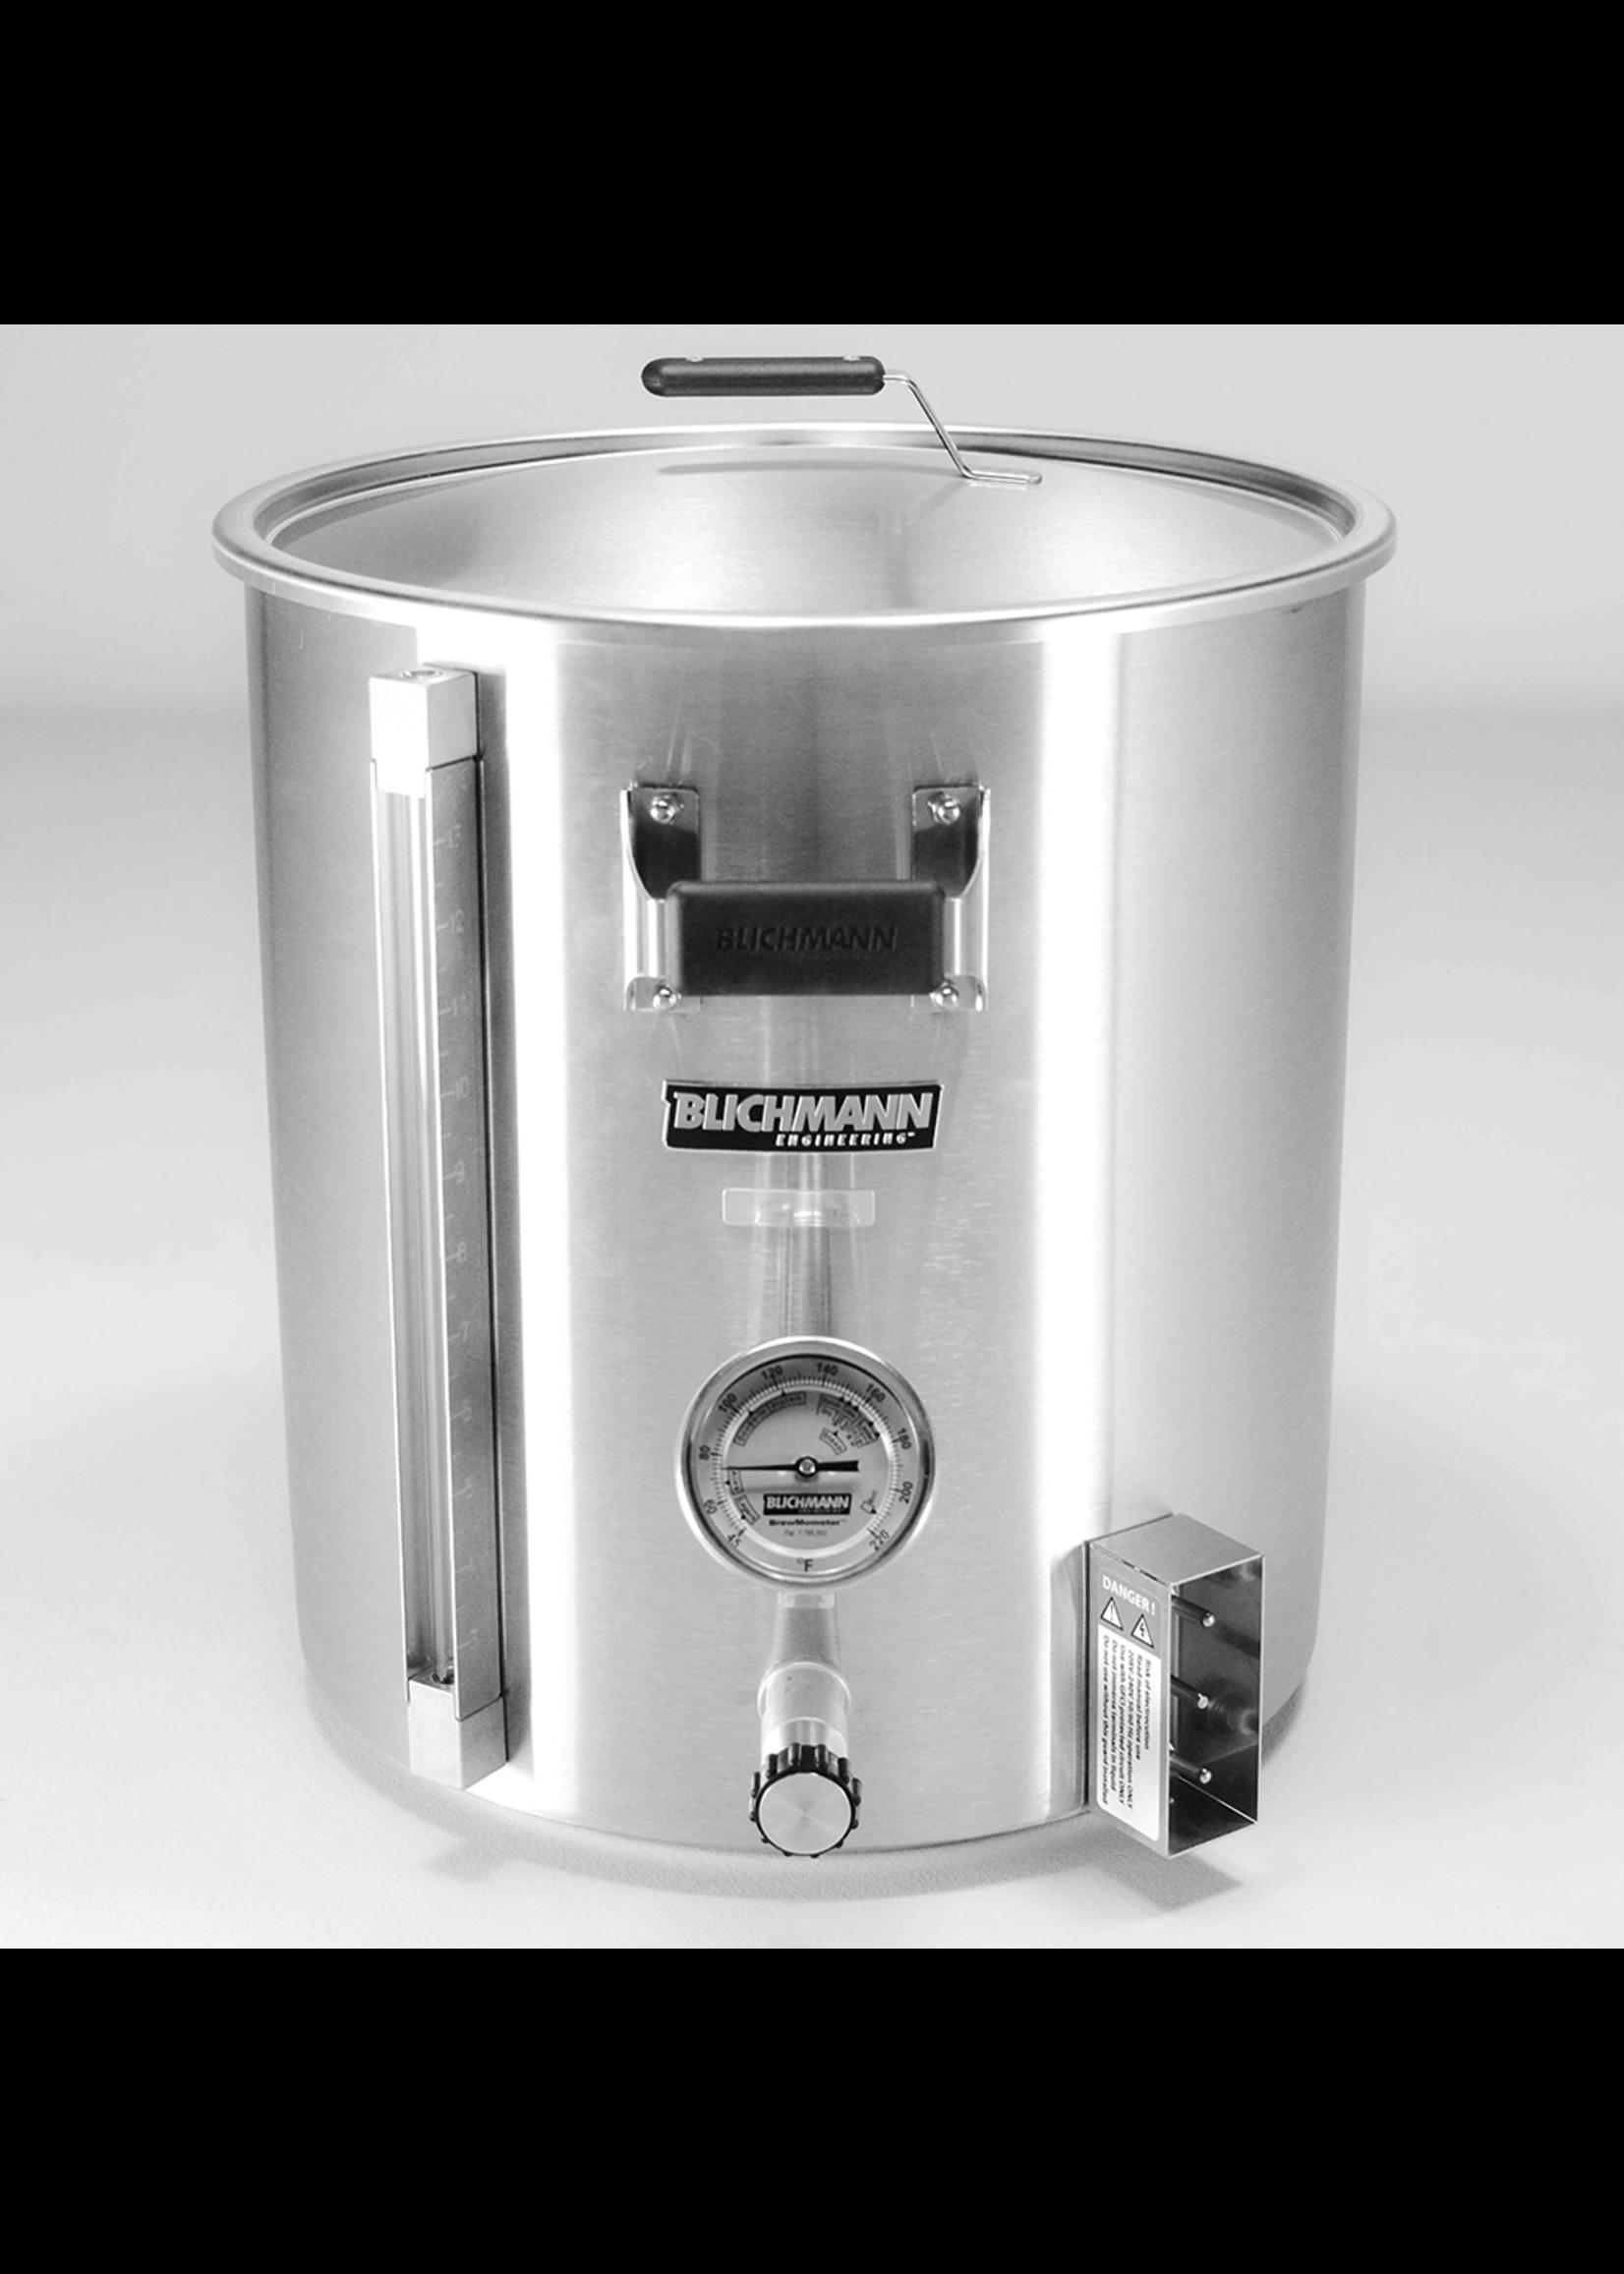 Blichmann Blichmann BoilerMaker G2 - 15 Gallon 240V Electric Brew Kettle (Fahrenheit)